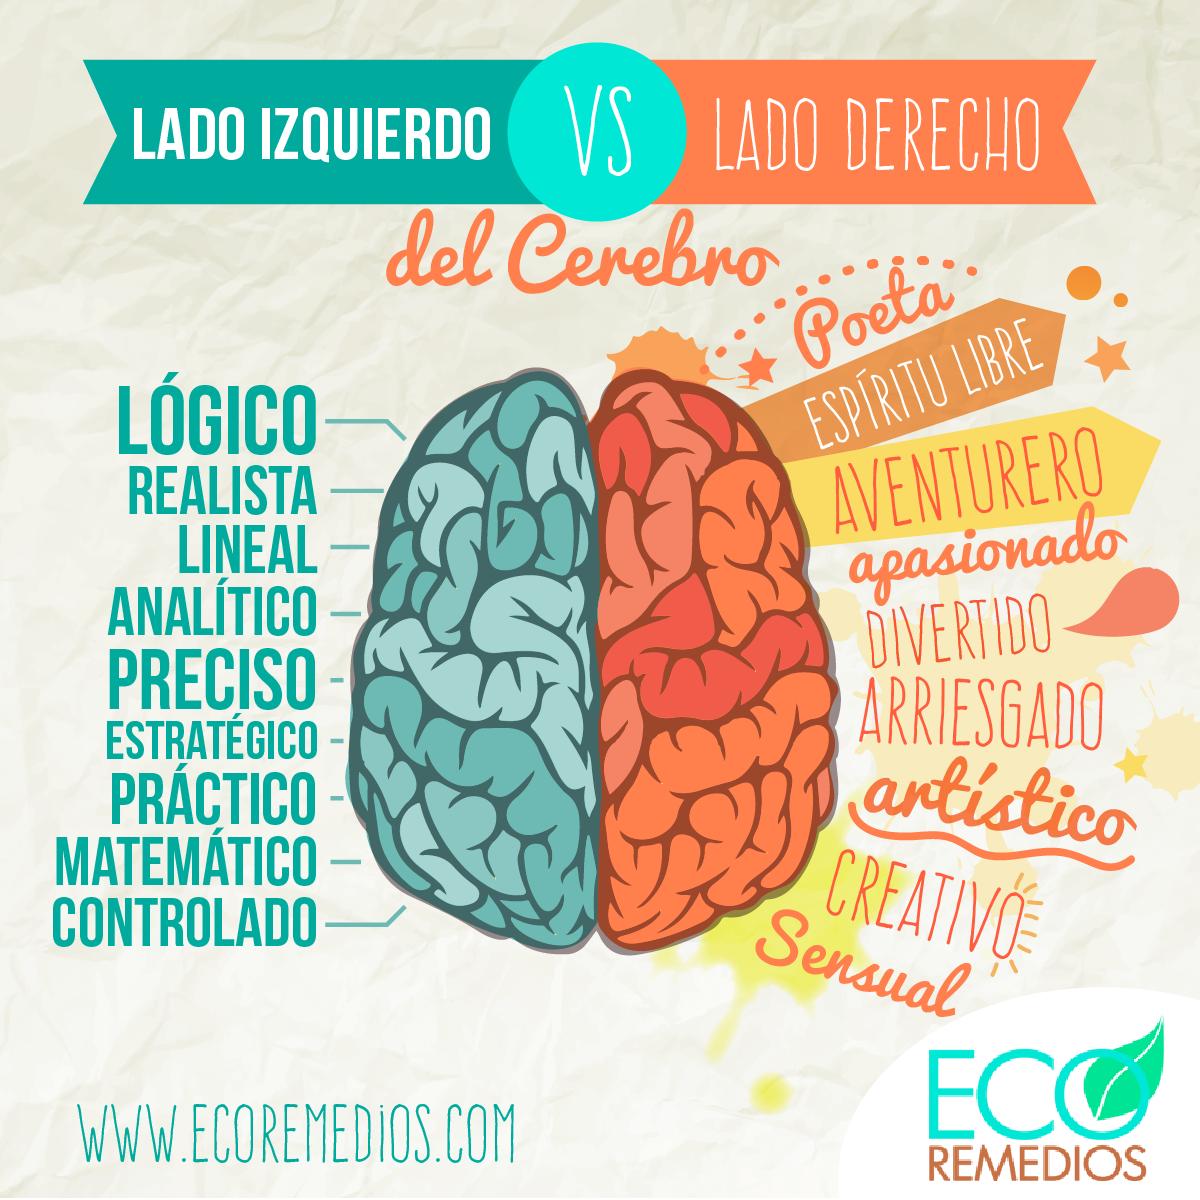 Infografia #Cerebro lado izquierdo #vs lado derecho #Creativo vs ...